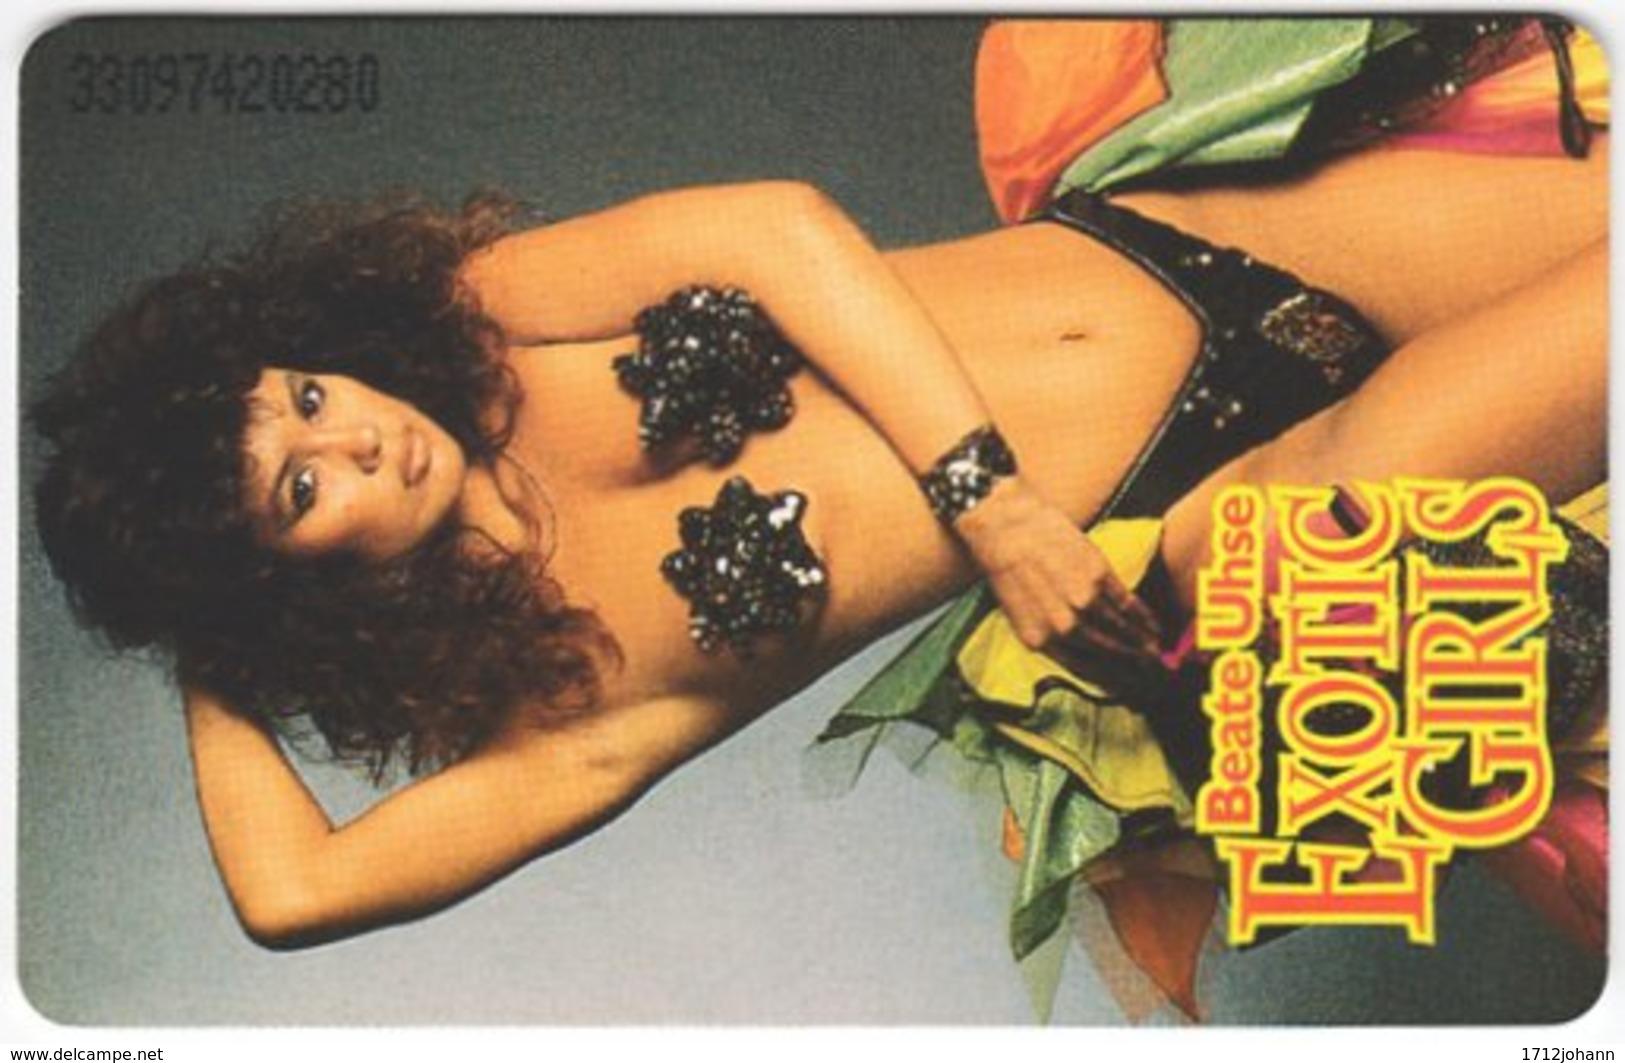 GERMANY O-Serie B-704 - 324F 09.93 - Woman, Erotic, Beate Uhse - Used - Deutschland